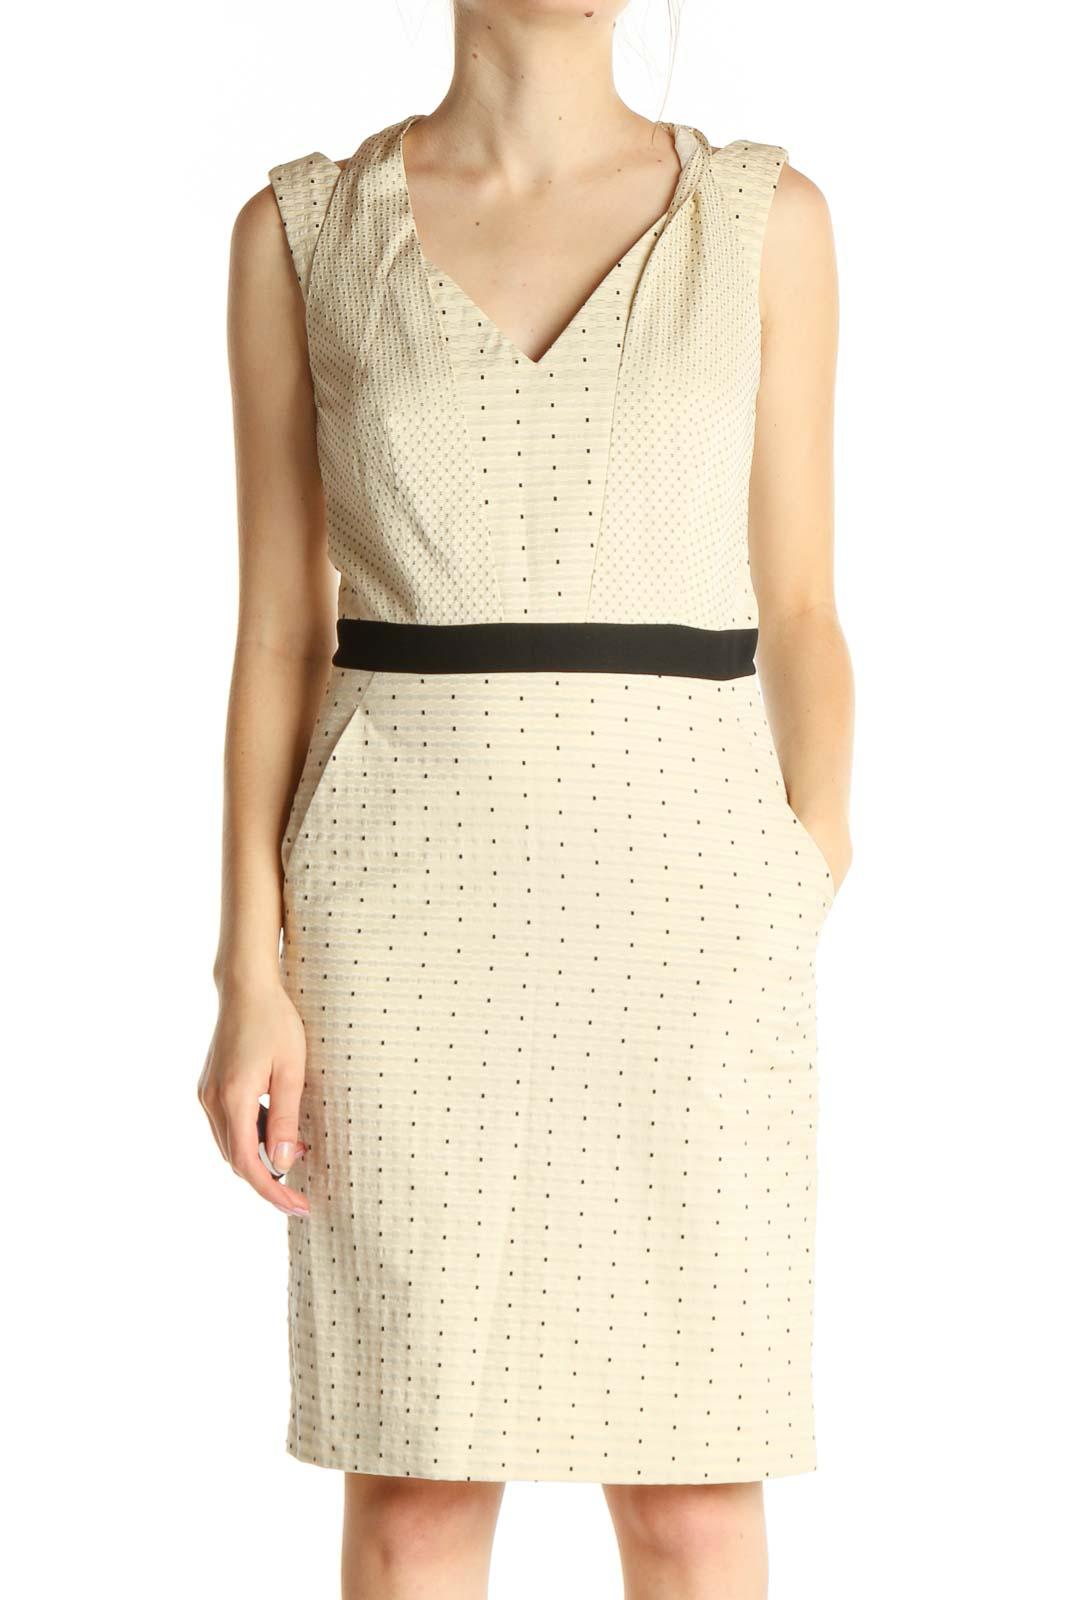 Beige Polka Dot Work Sheath Dress Front